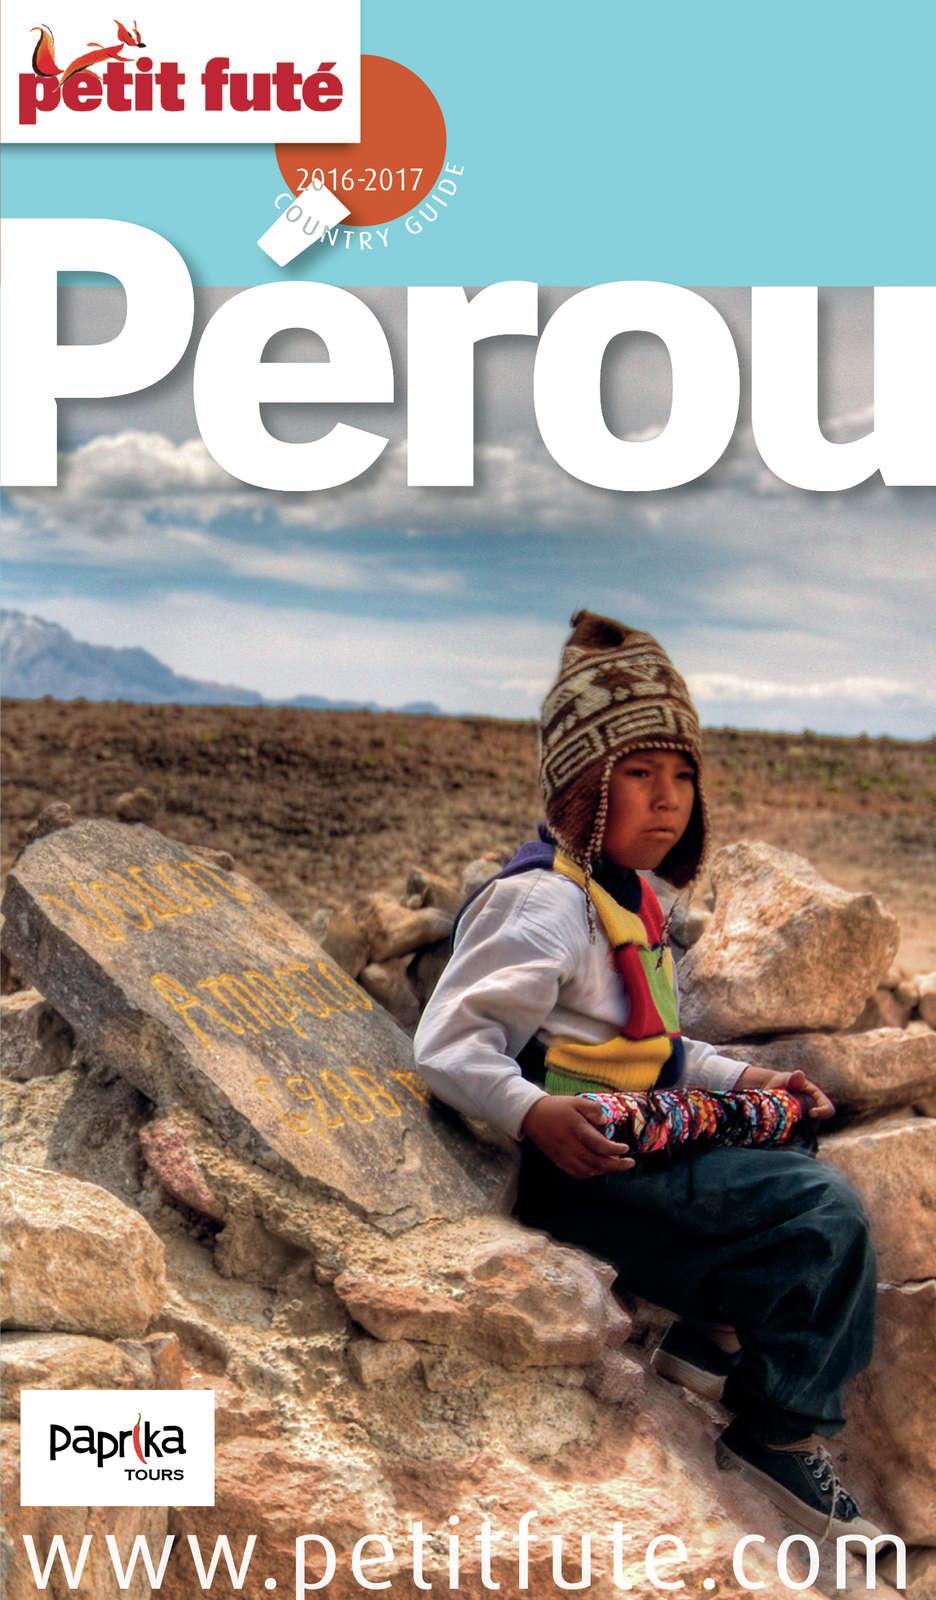 Petit Futé - Pérou 2016-2017